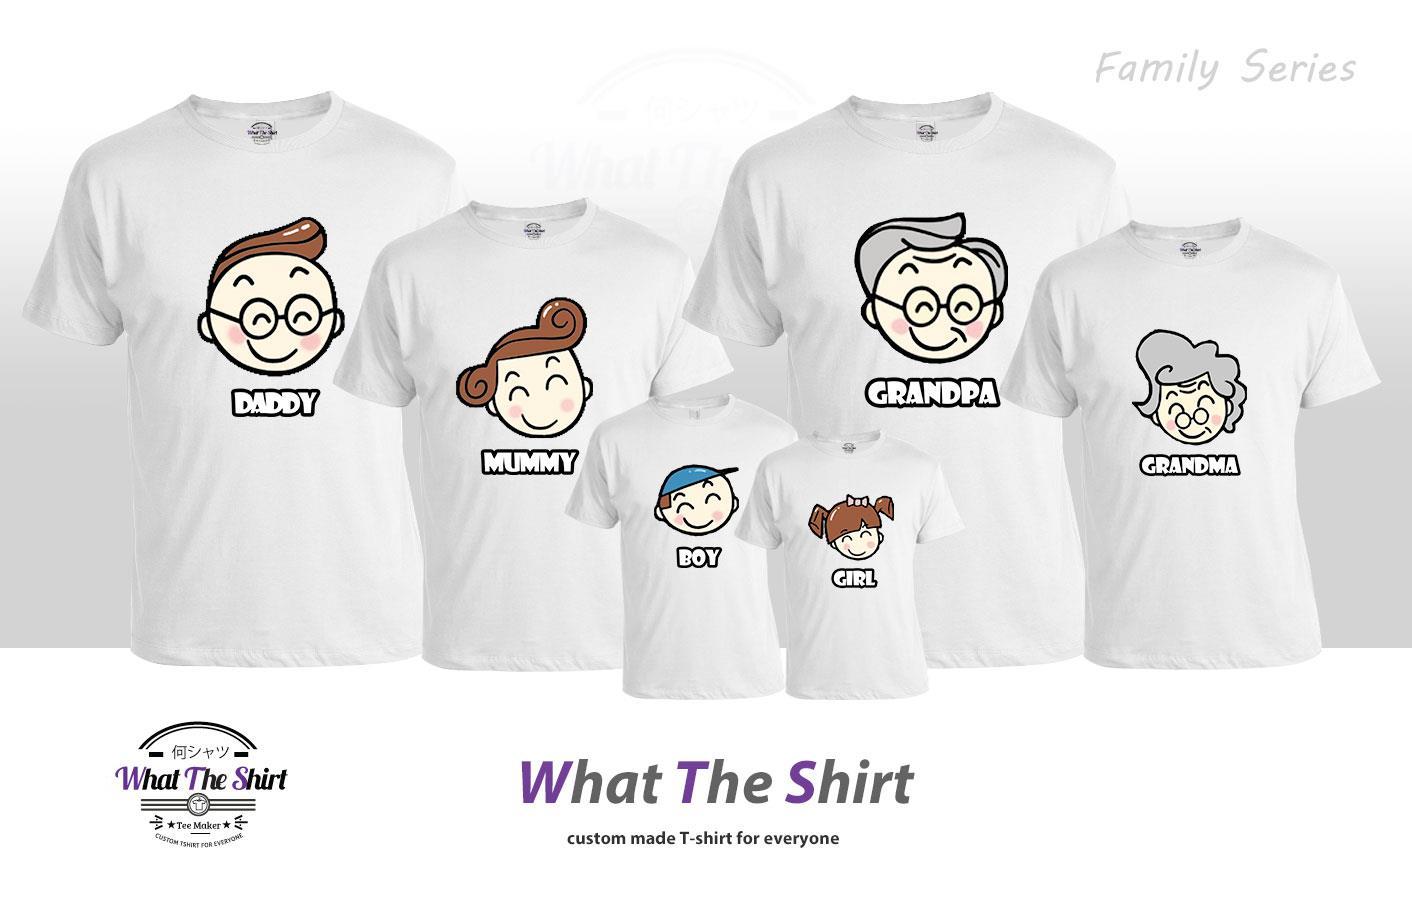 T shirt custom made custom shirt for Travel t shirt design ideas